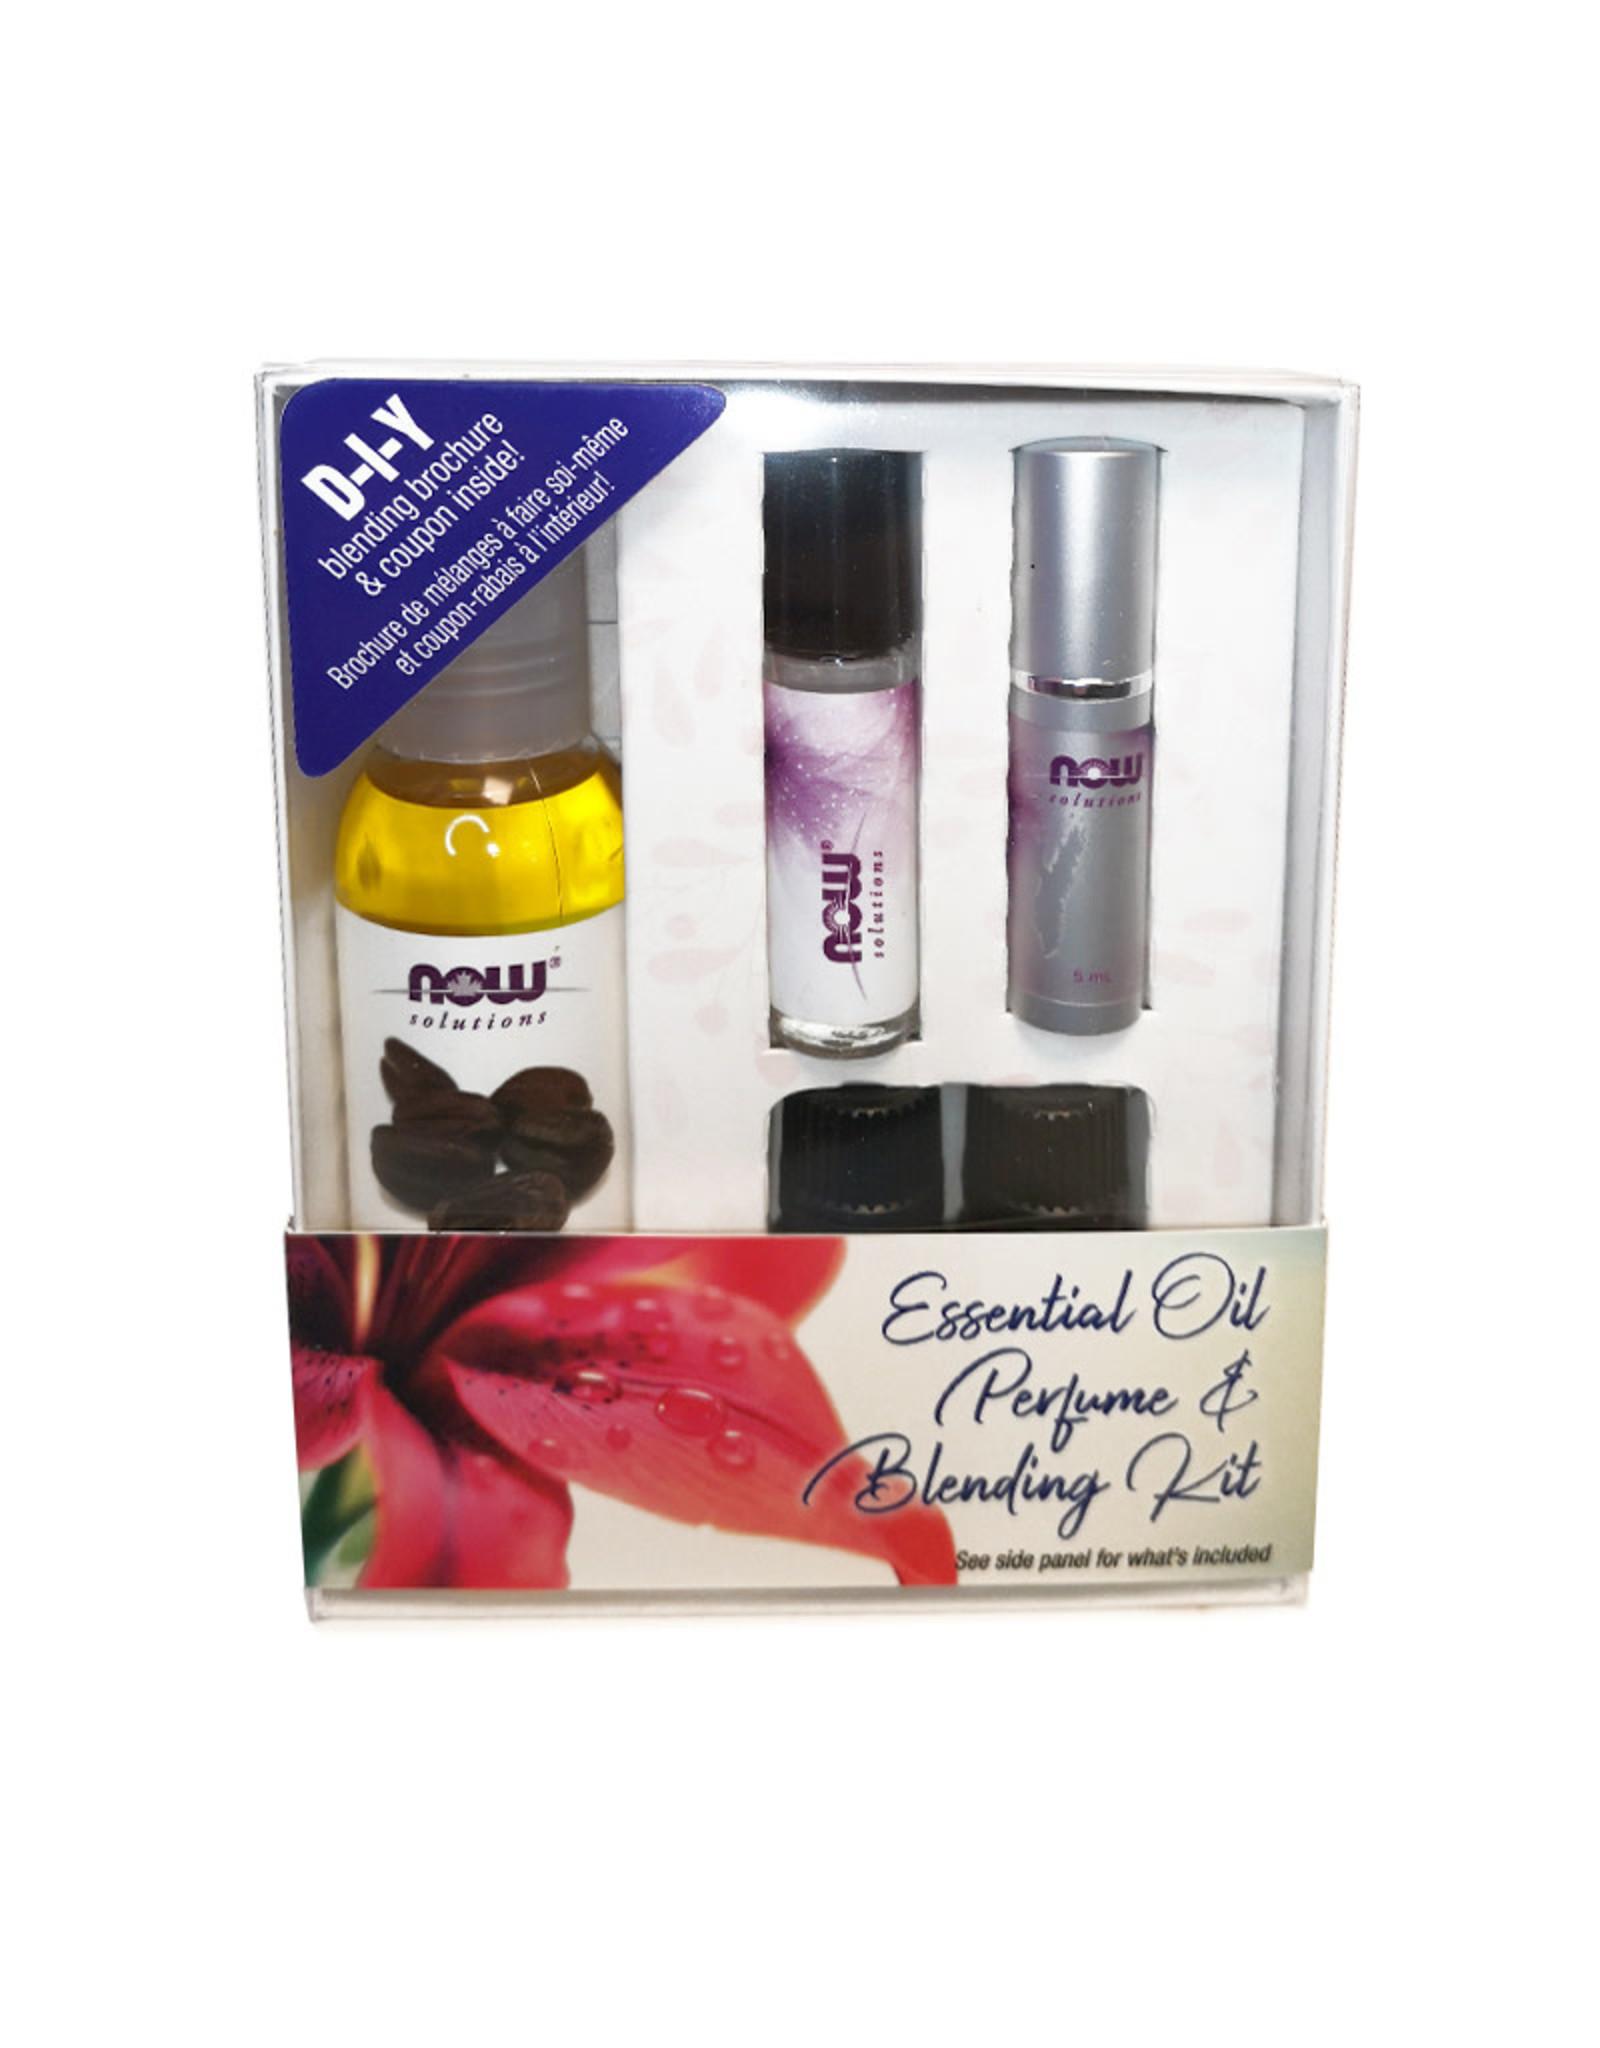 NOW Essential Oils NOW Essentials - Perfume & Blending Gift Set